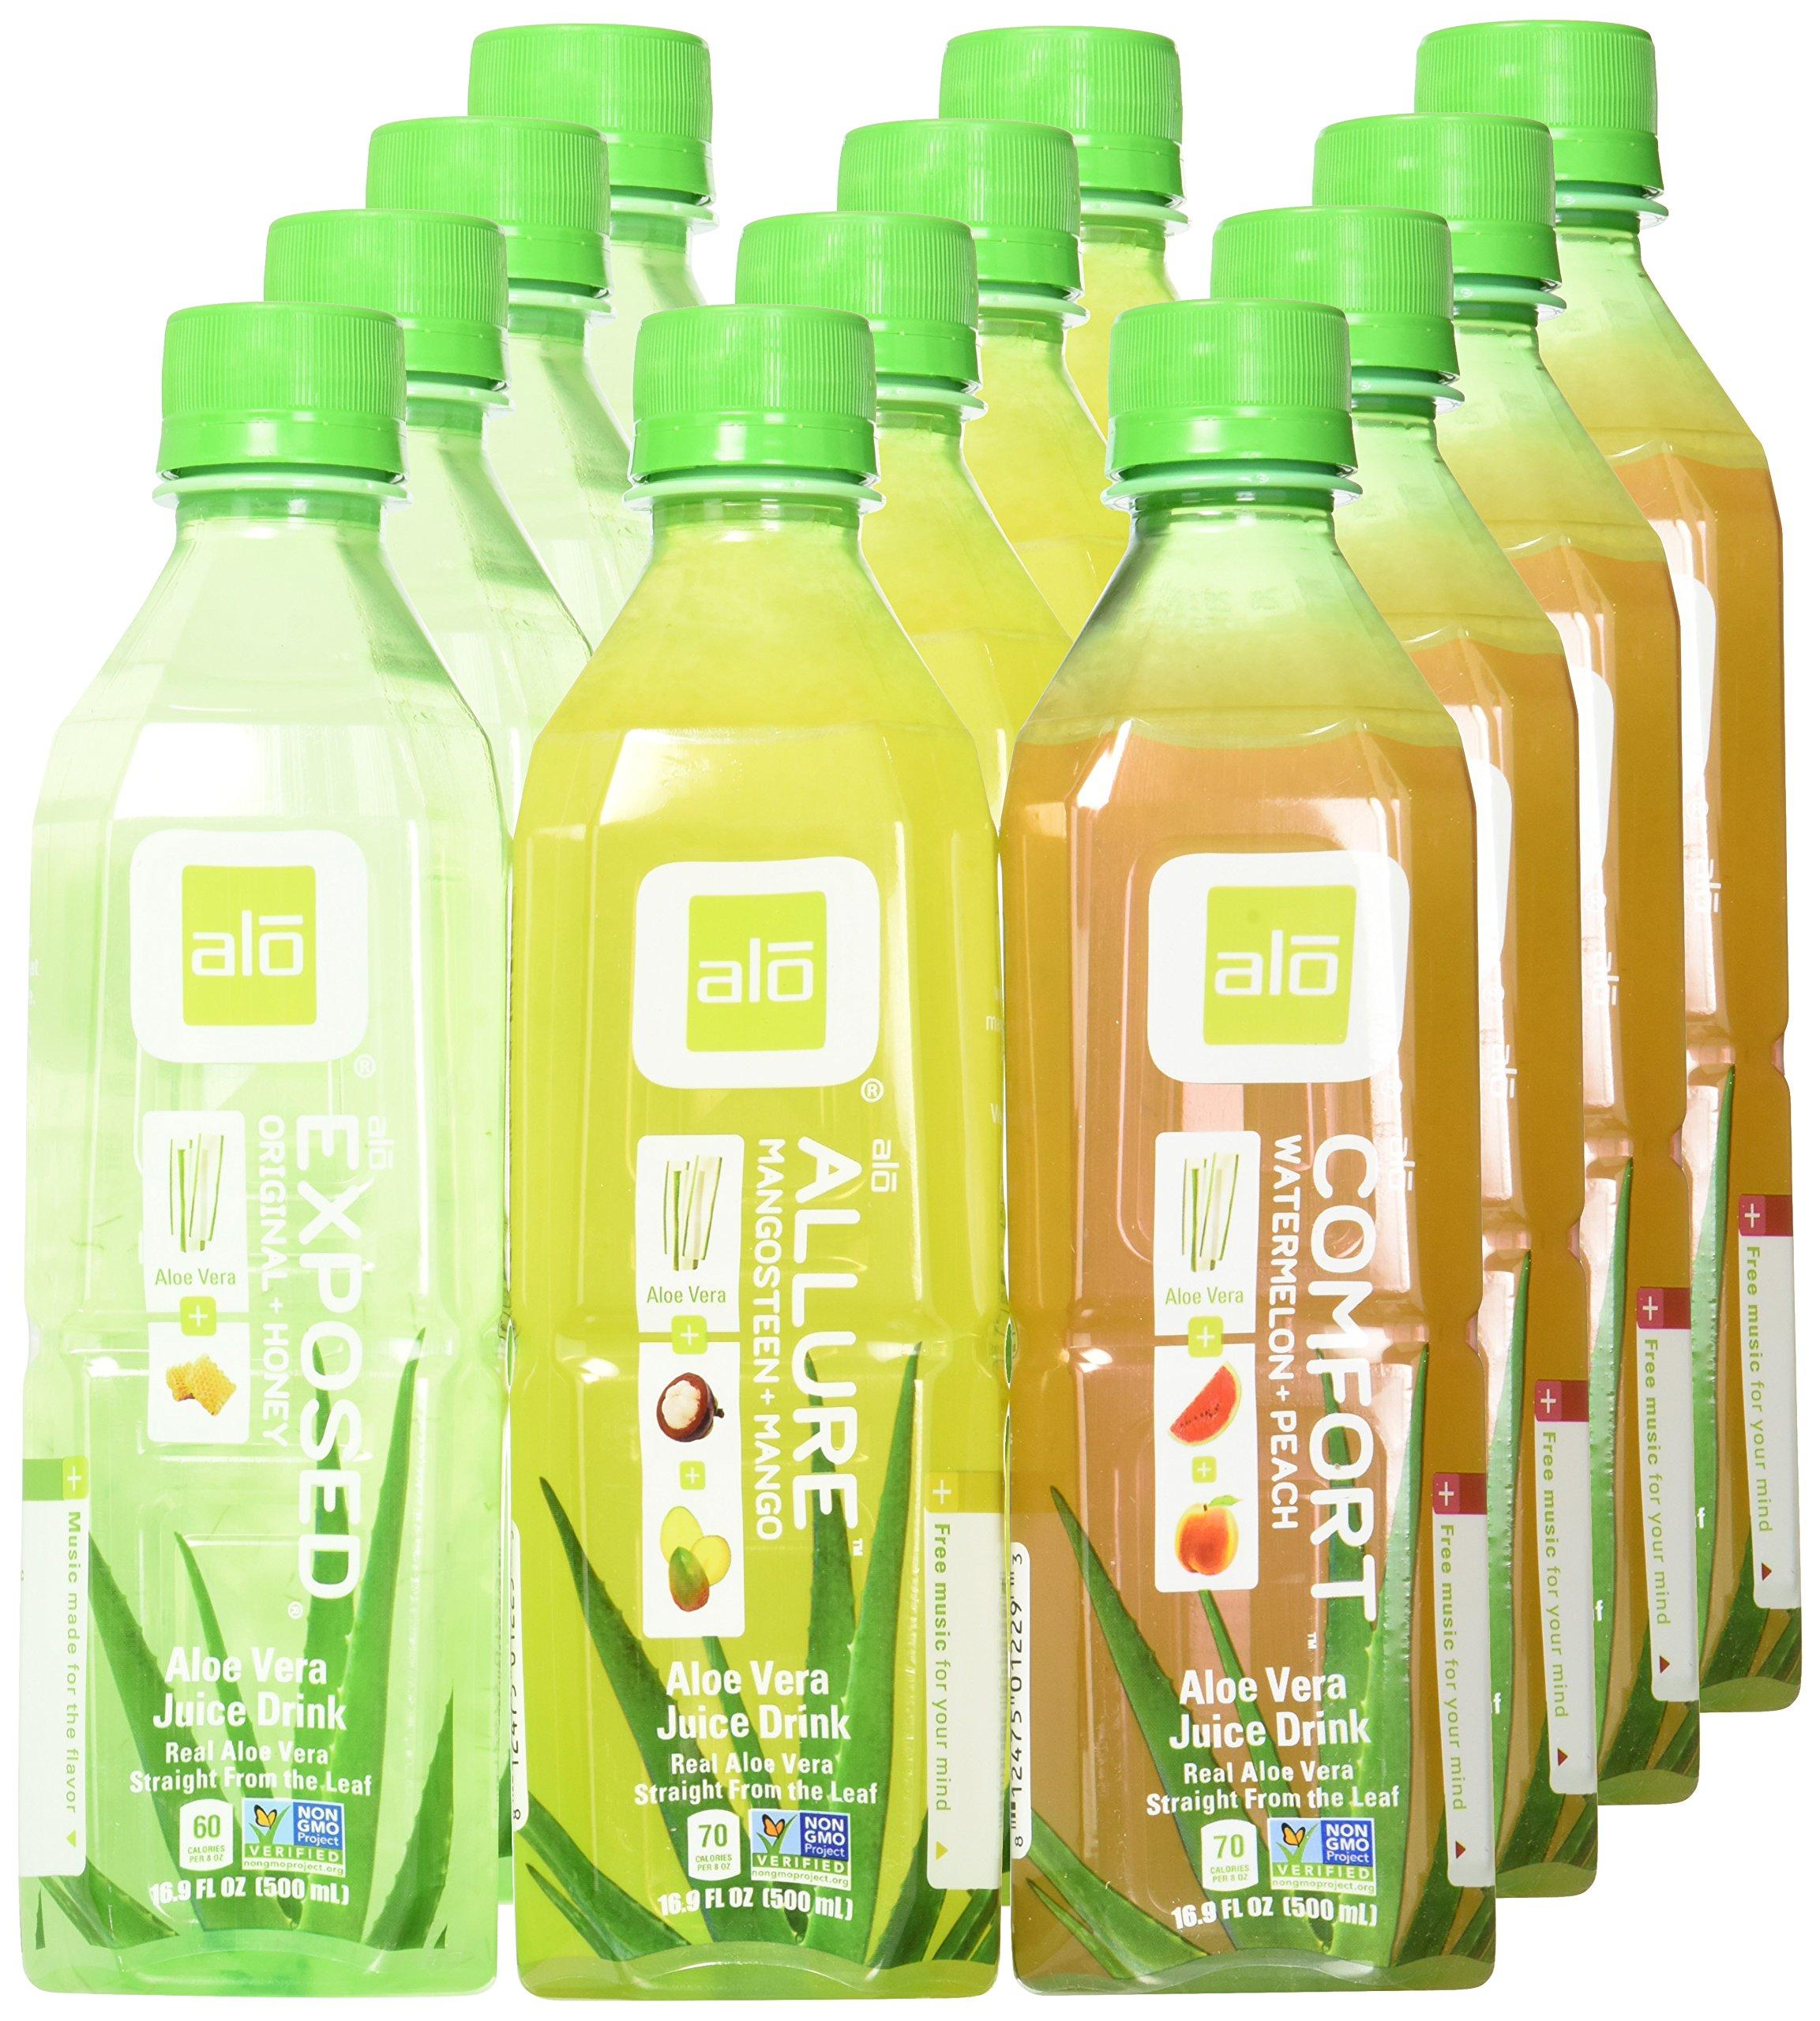 alo Aloe Vera Drink Variety 16.9 oz Bottle (Pack of 12) by ALO (Image #2)